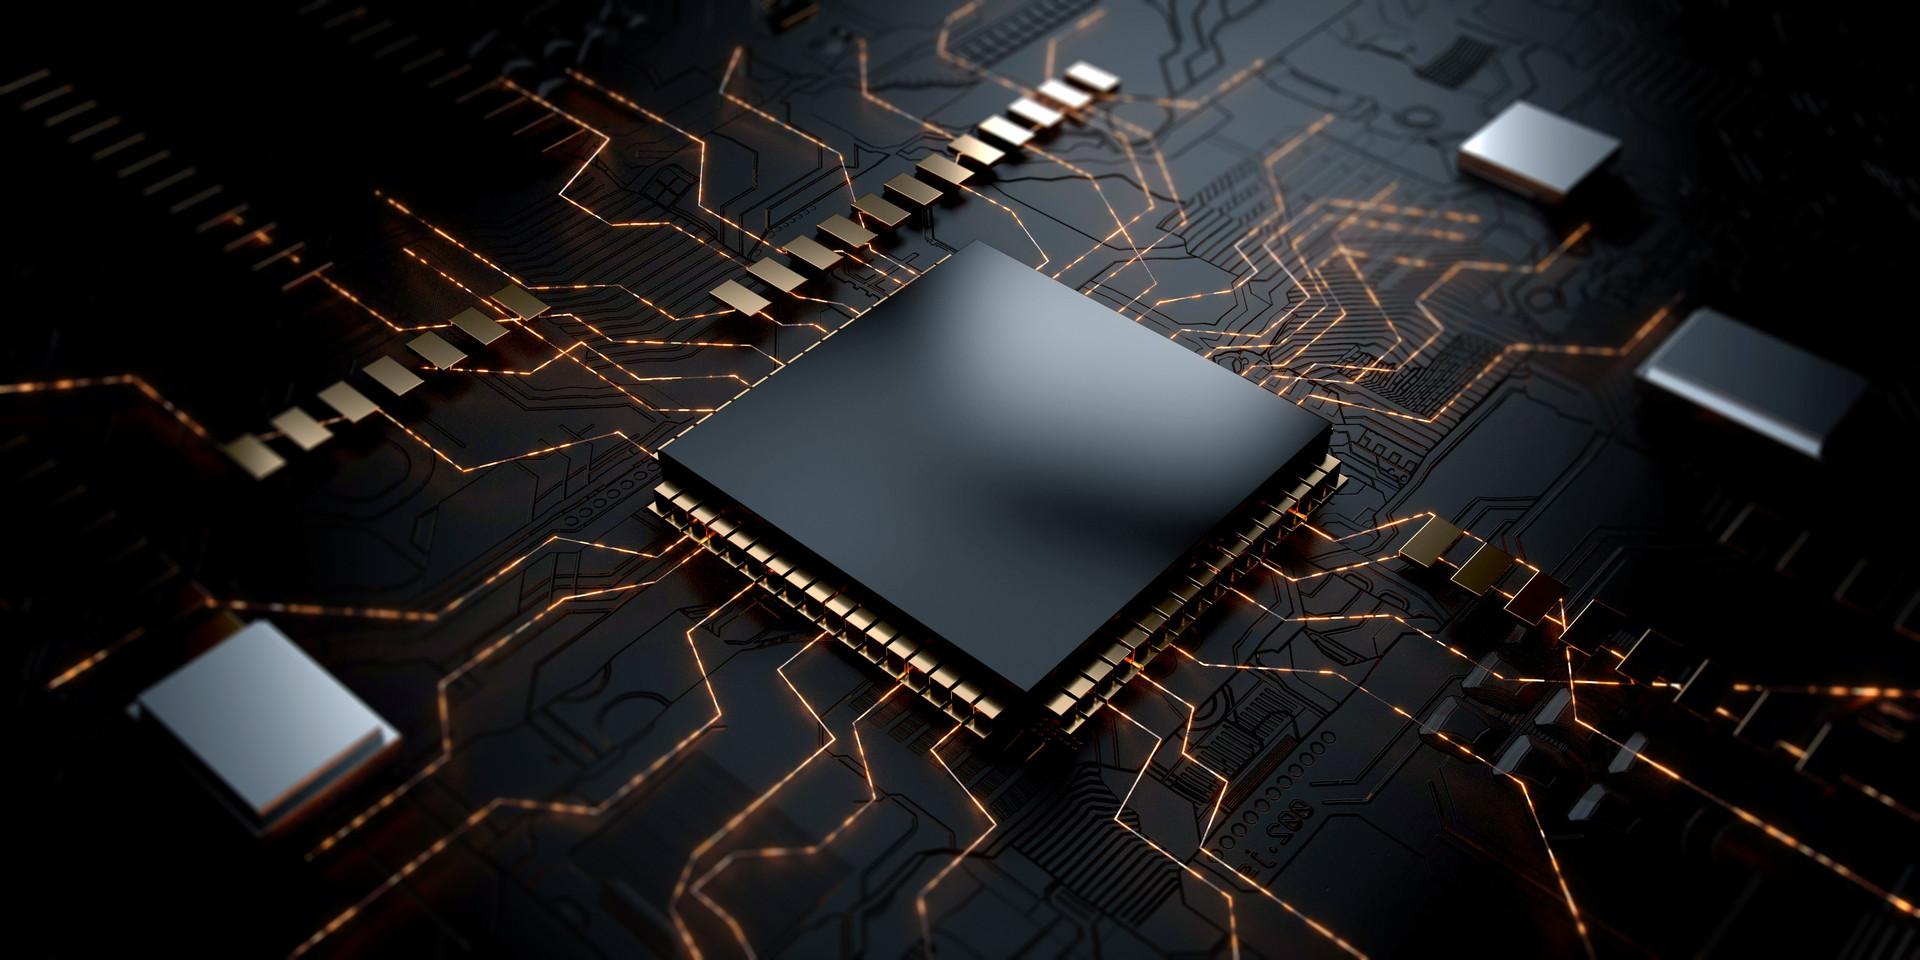 ASML:逻辑芯片需求强劲延续至2020年 存储器则疲弱复苏中